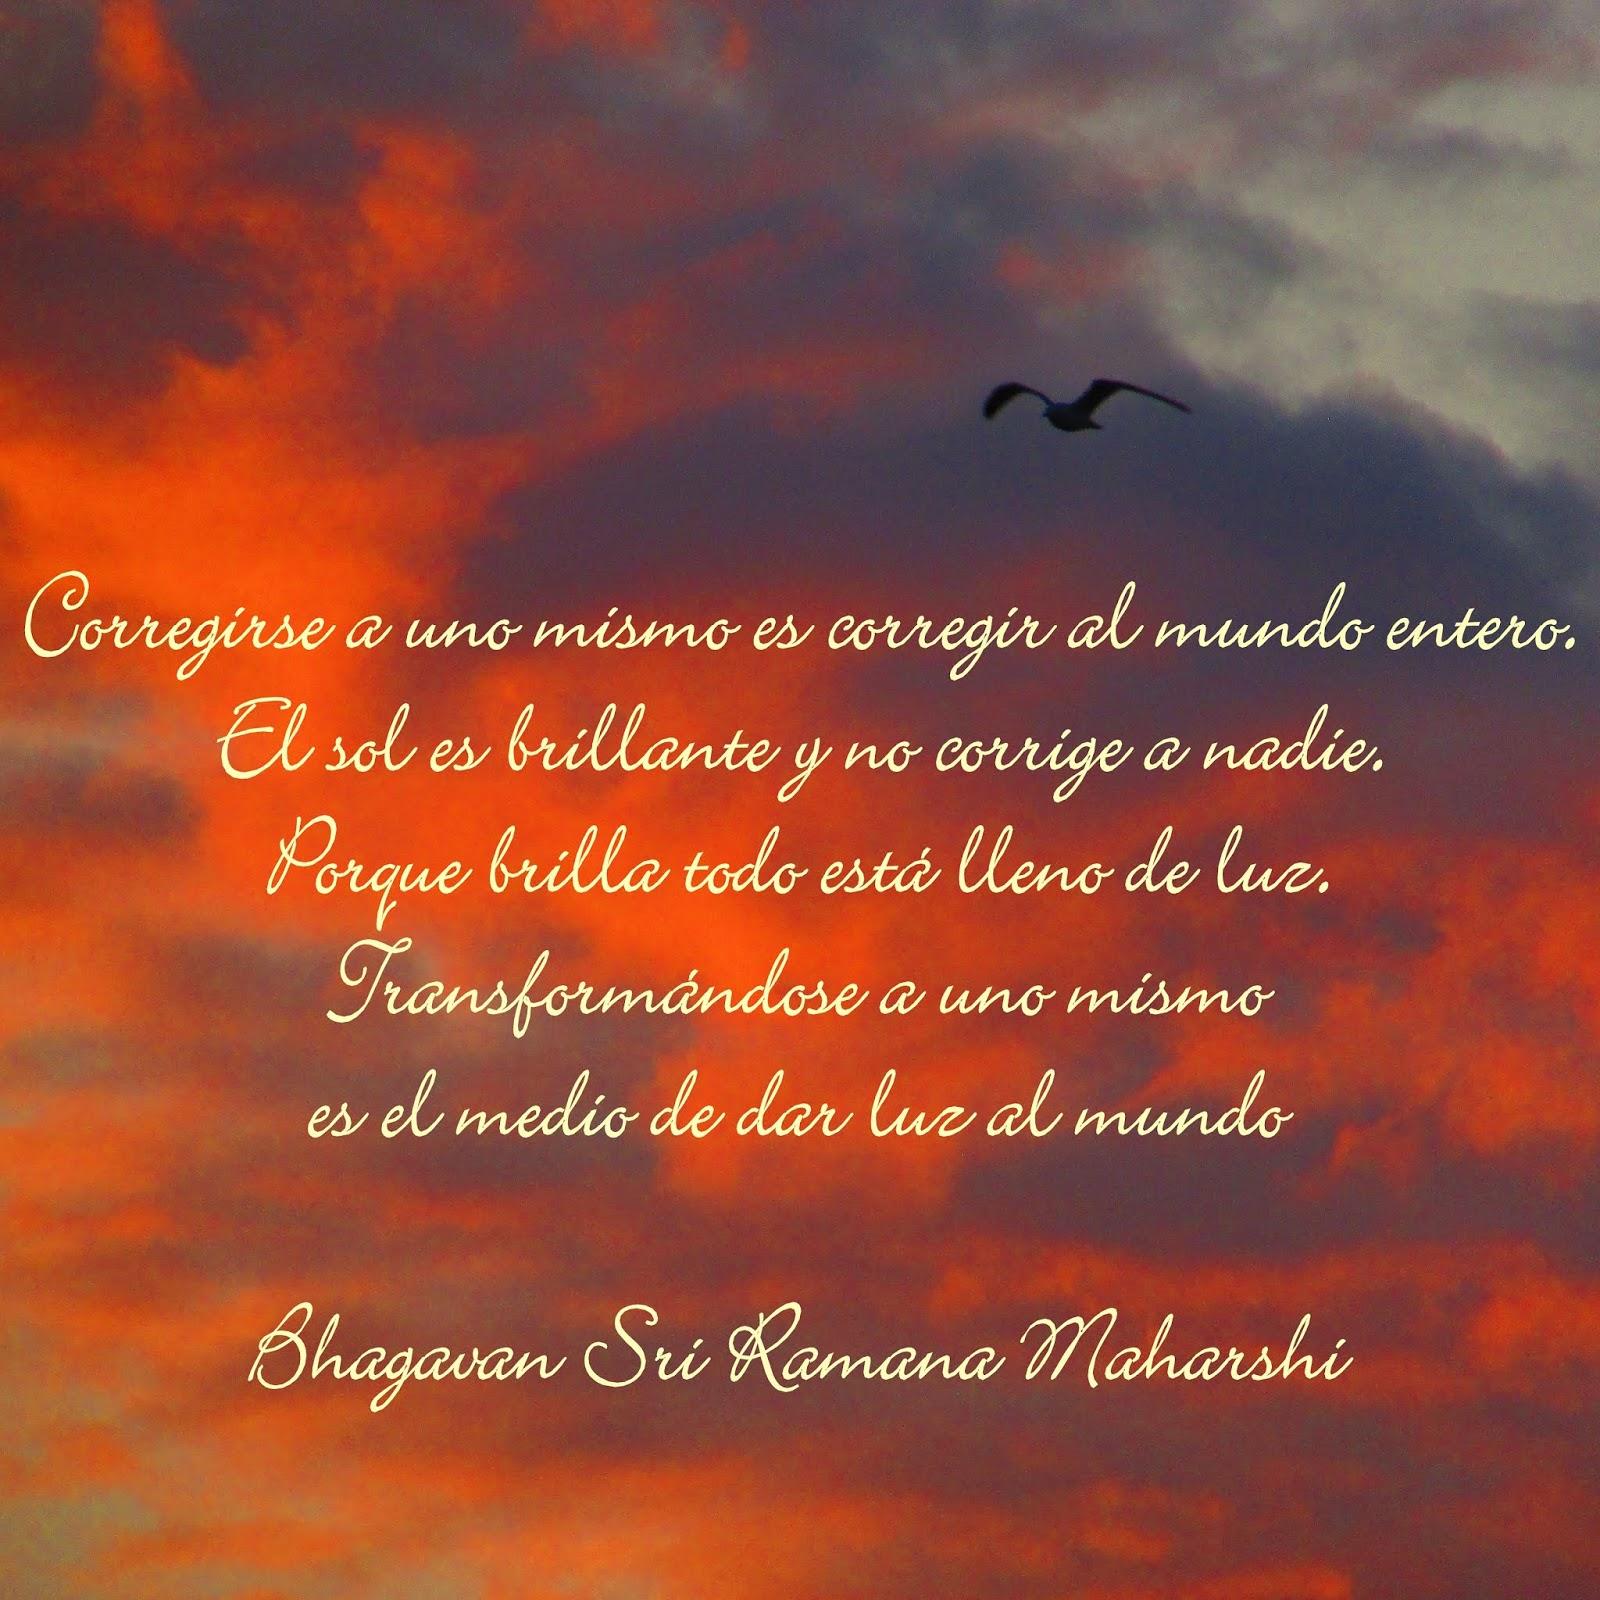 Frase De Bhagavan Sri Ramana Maharshi